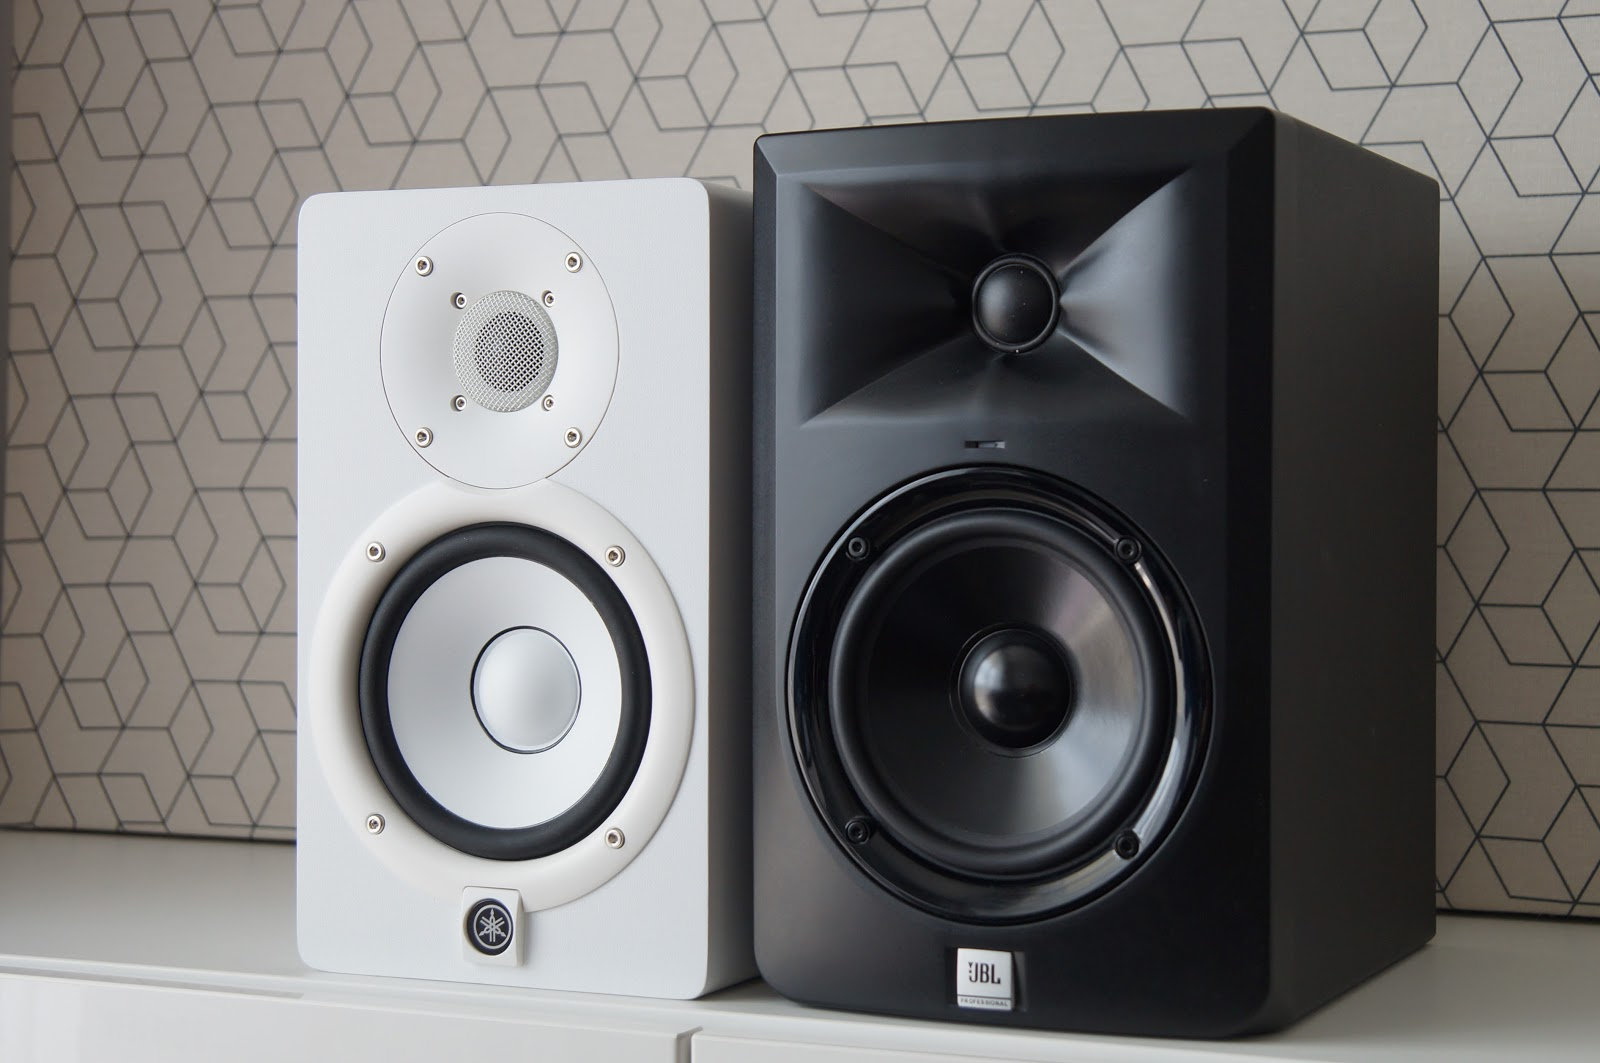 Loa Yamaha MSP3 series